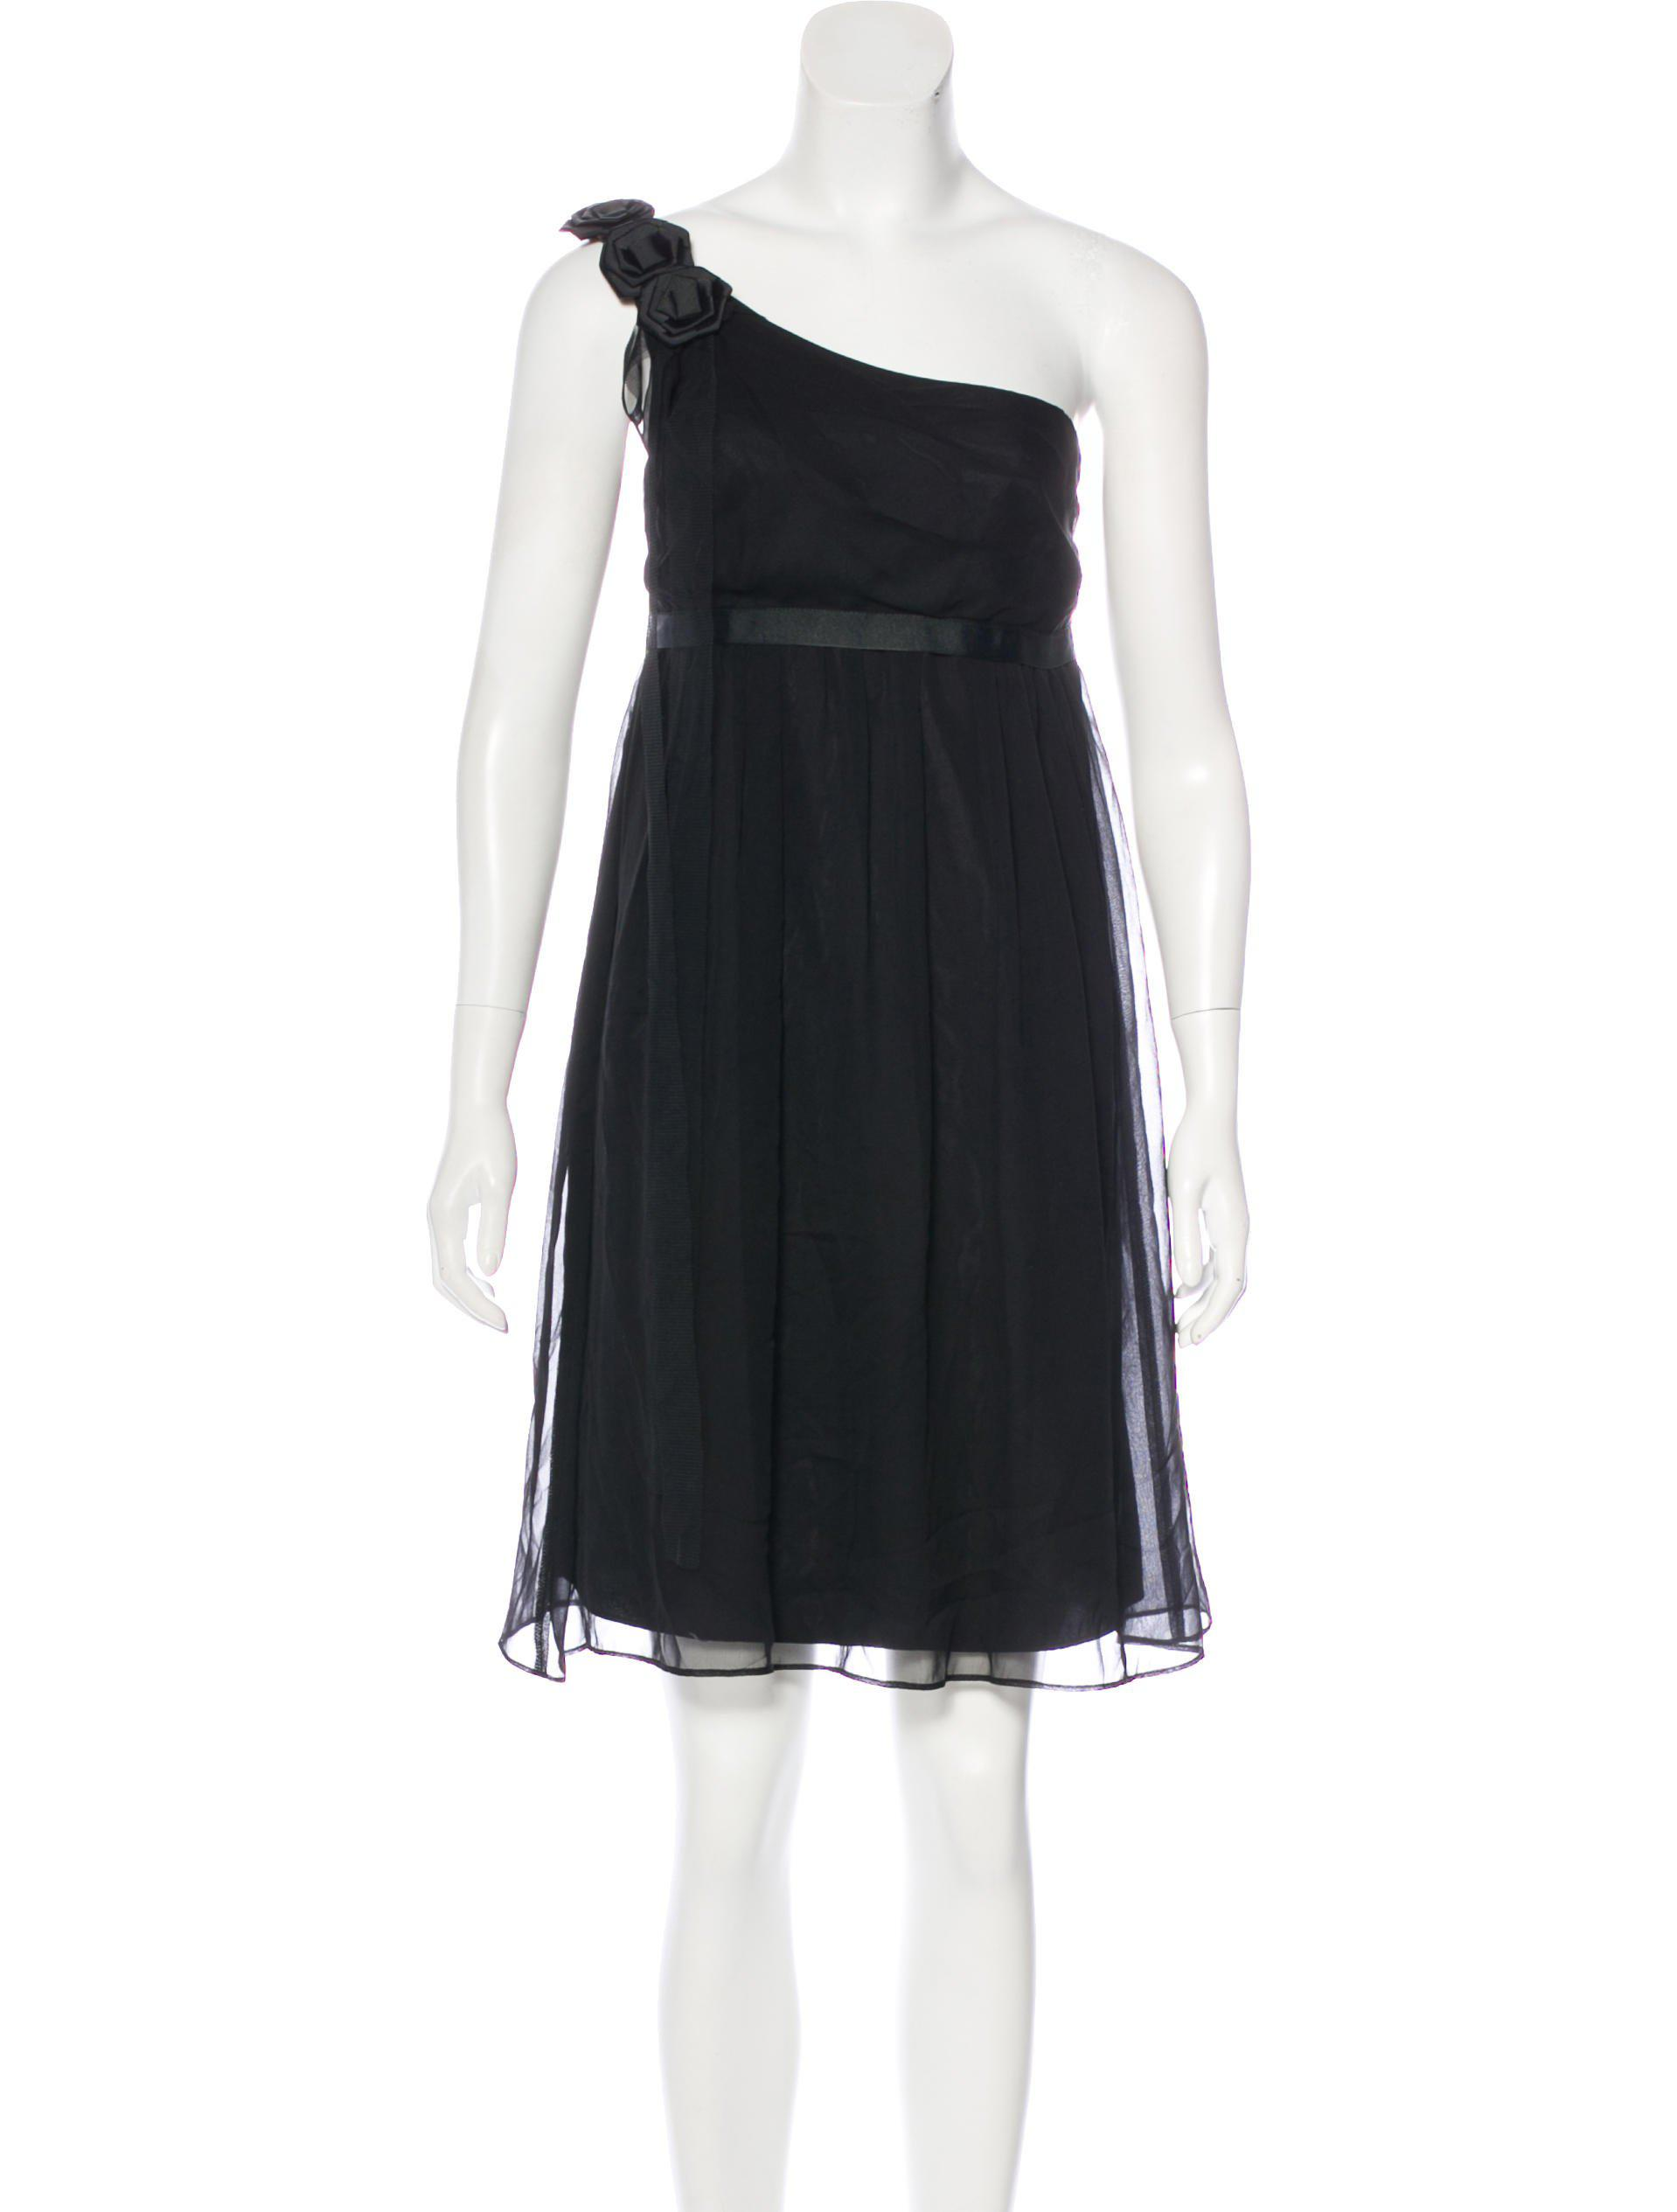 f54c638147e Lyst - David Meister One-shoulder Mini Dress in Black